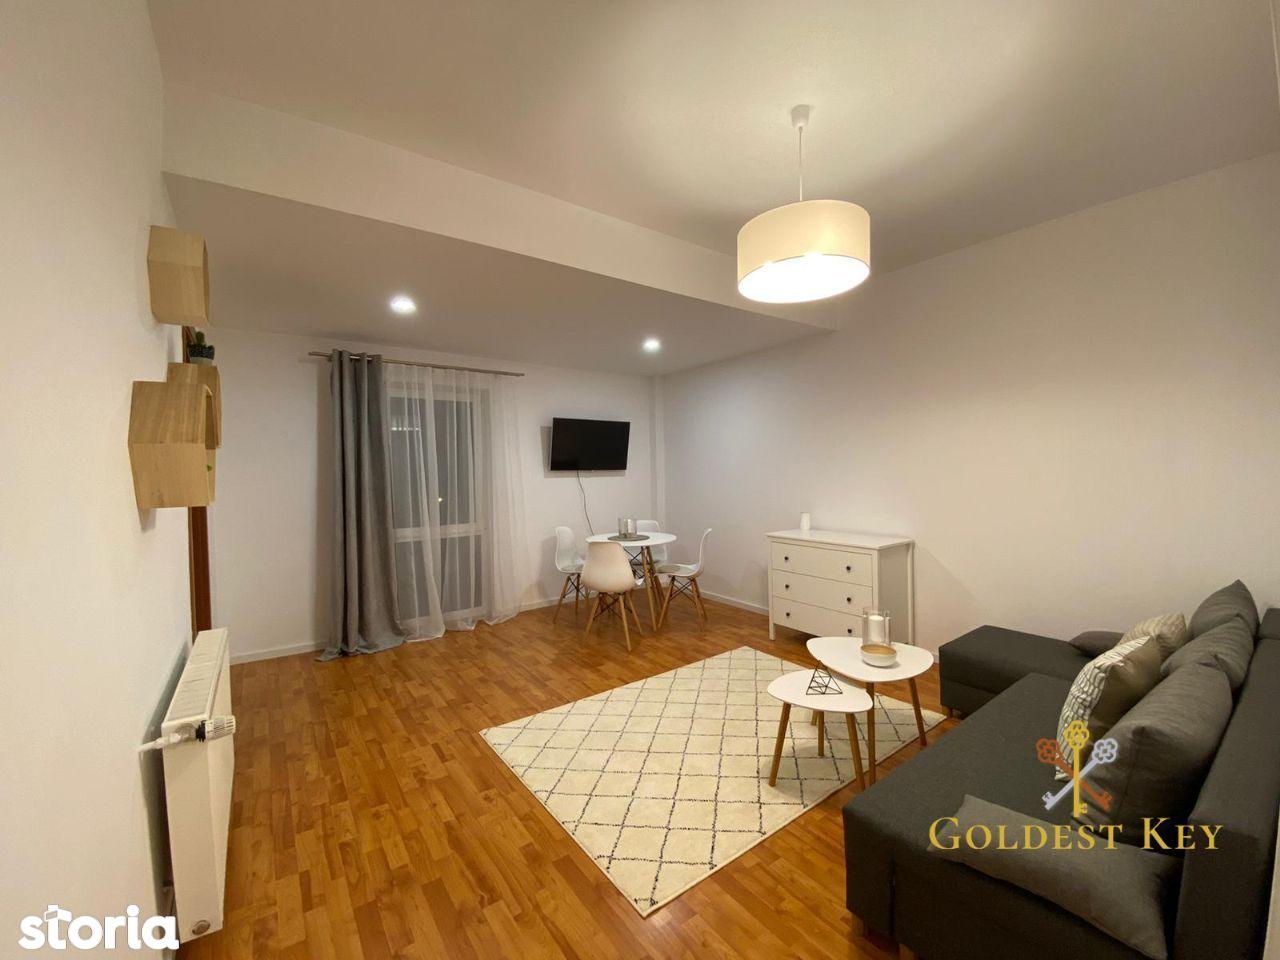 Goldest Key - Apartament modern 45 mp